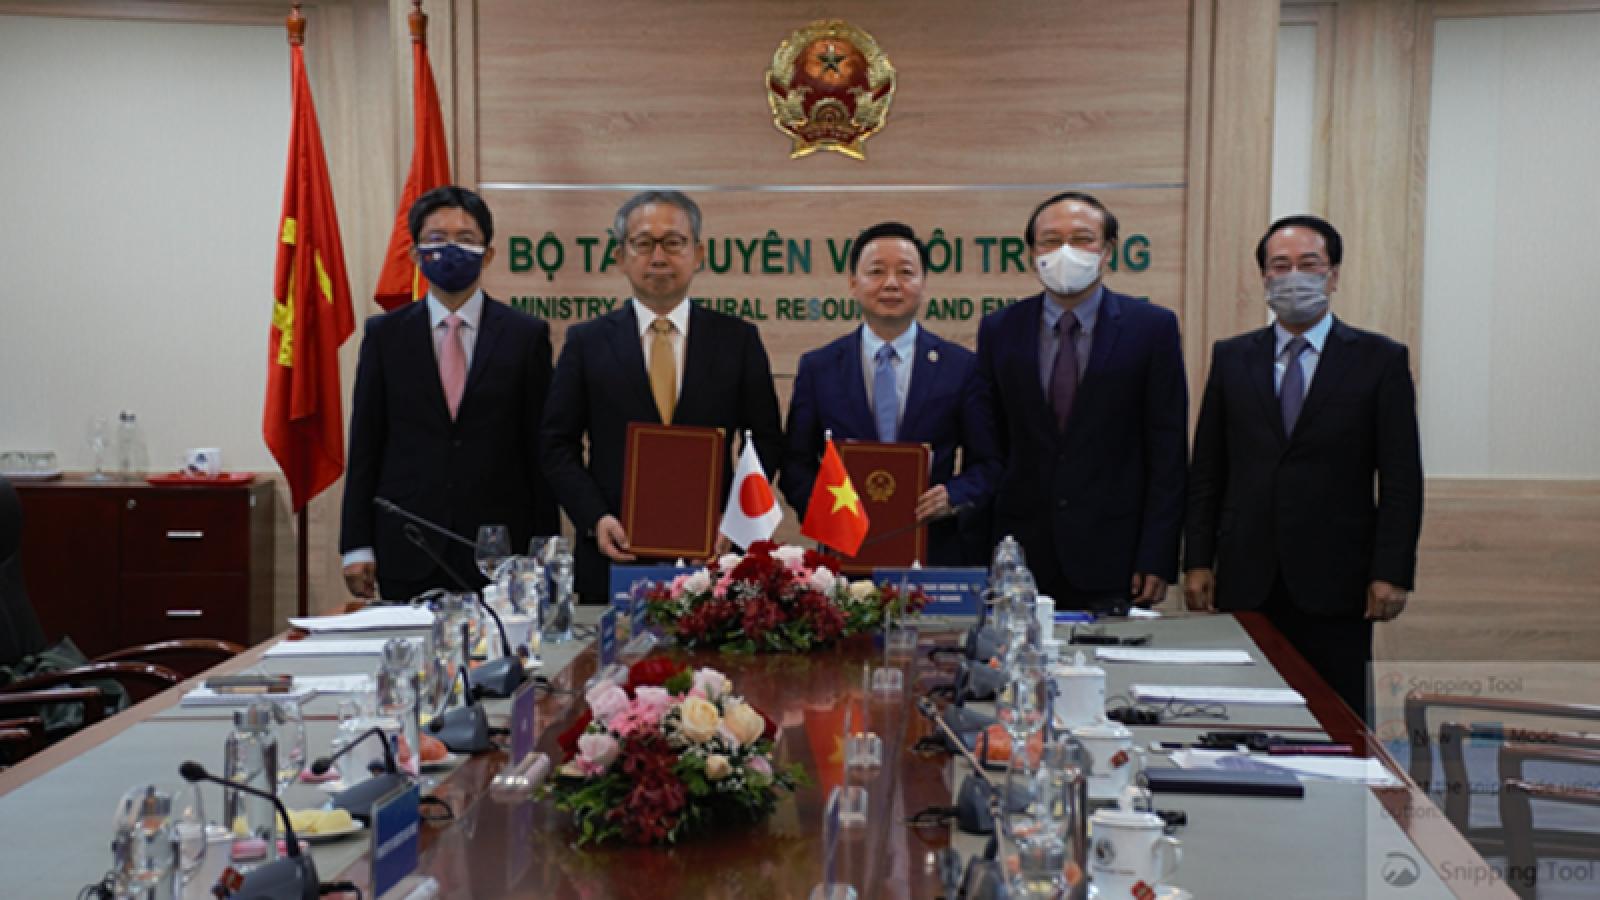 Vietnam, Japan sign MoU on low-carbon growth